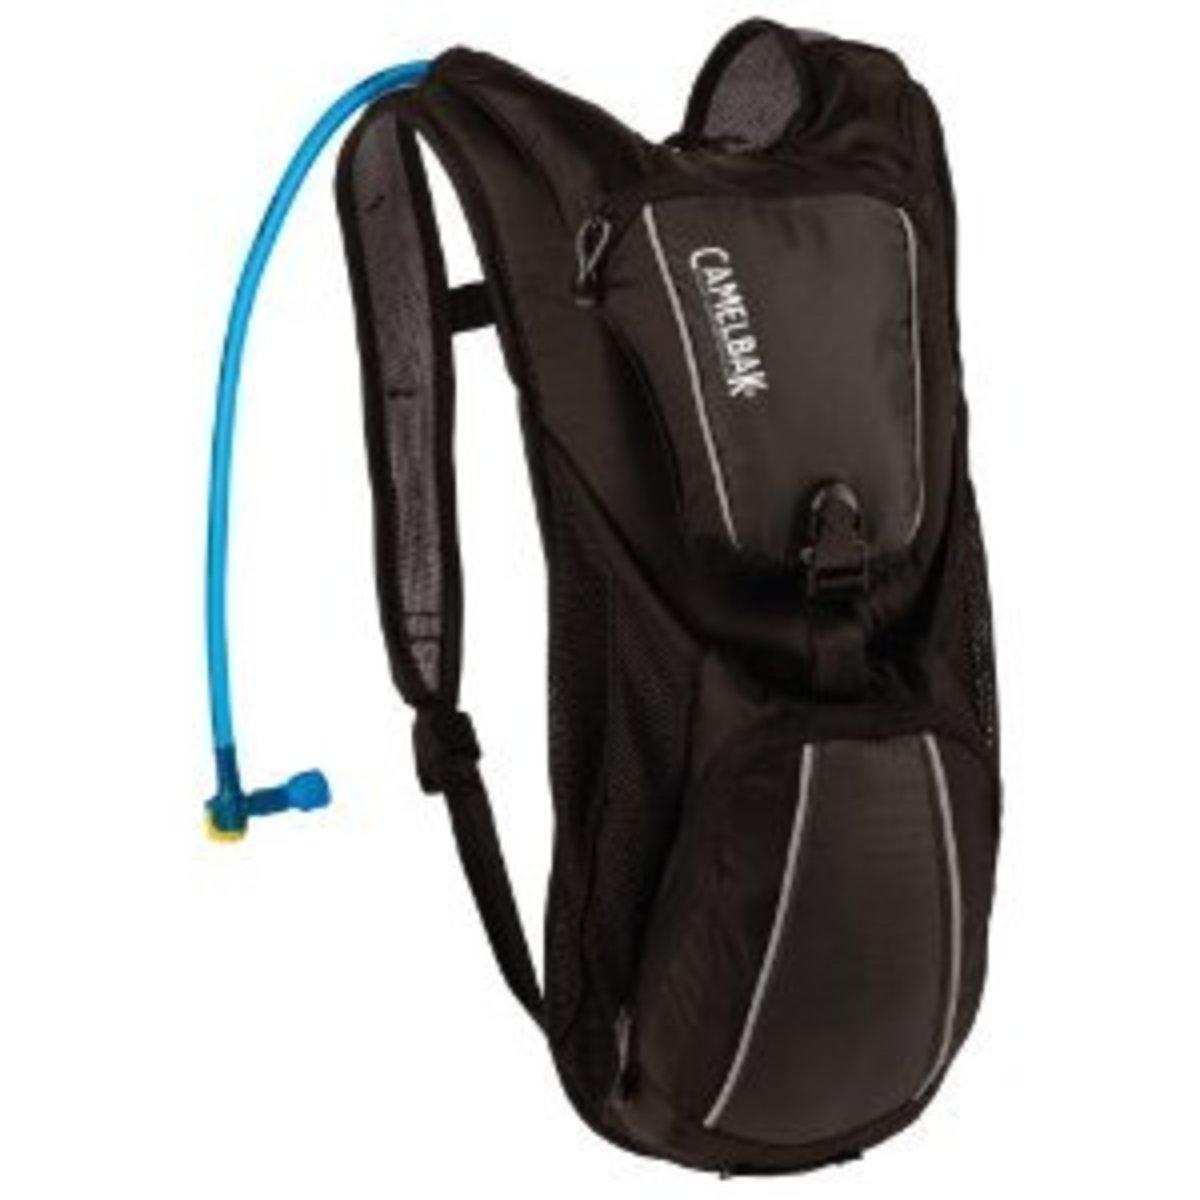 CamelBak Rogue 70-Ounce Hydration Pack